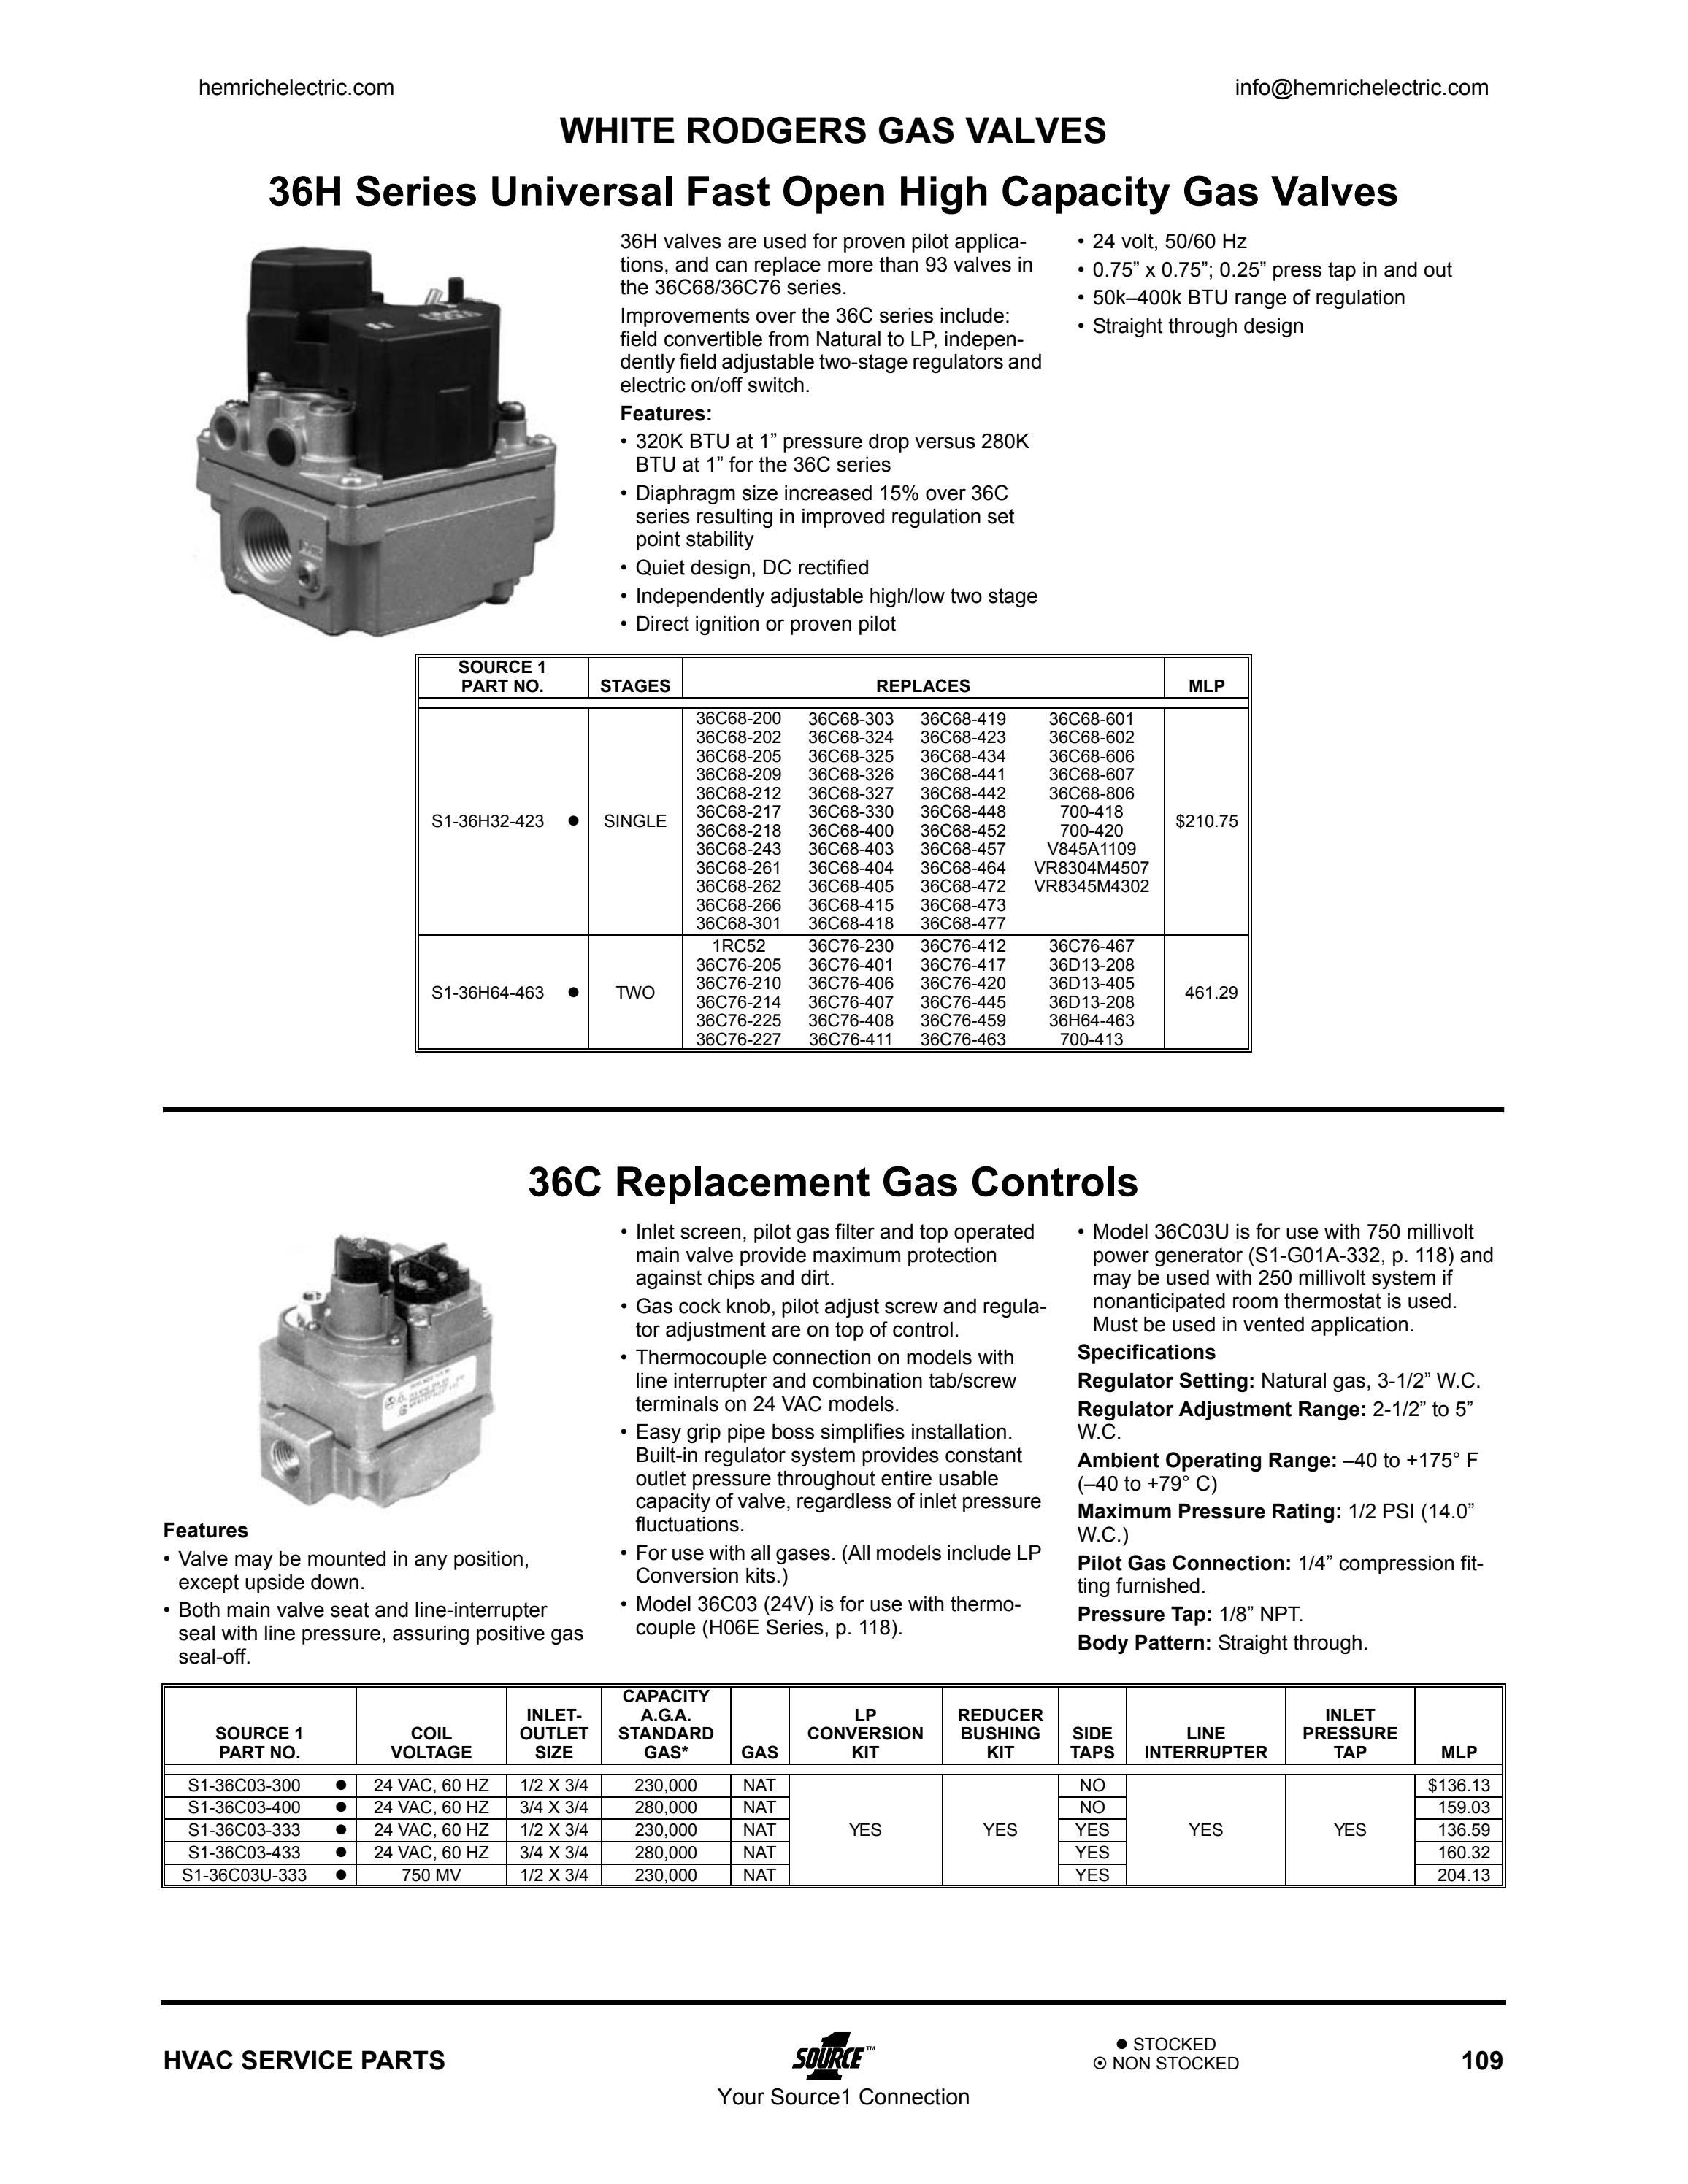 wiring diagram 700 434 gas valve best wiring library Gas Furnace Thermostat Wiring wiring diagram 700 434 gas valve 32 wiring diagram how millivolt gas valves work asco solenoid